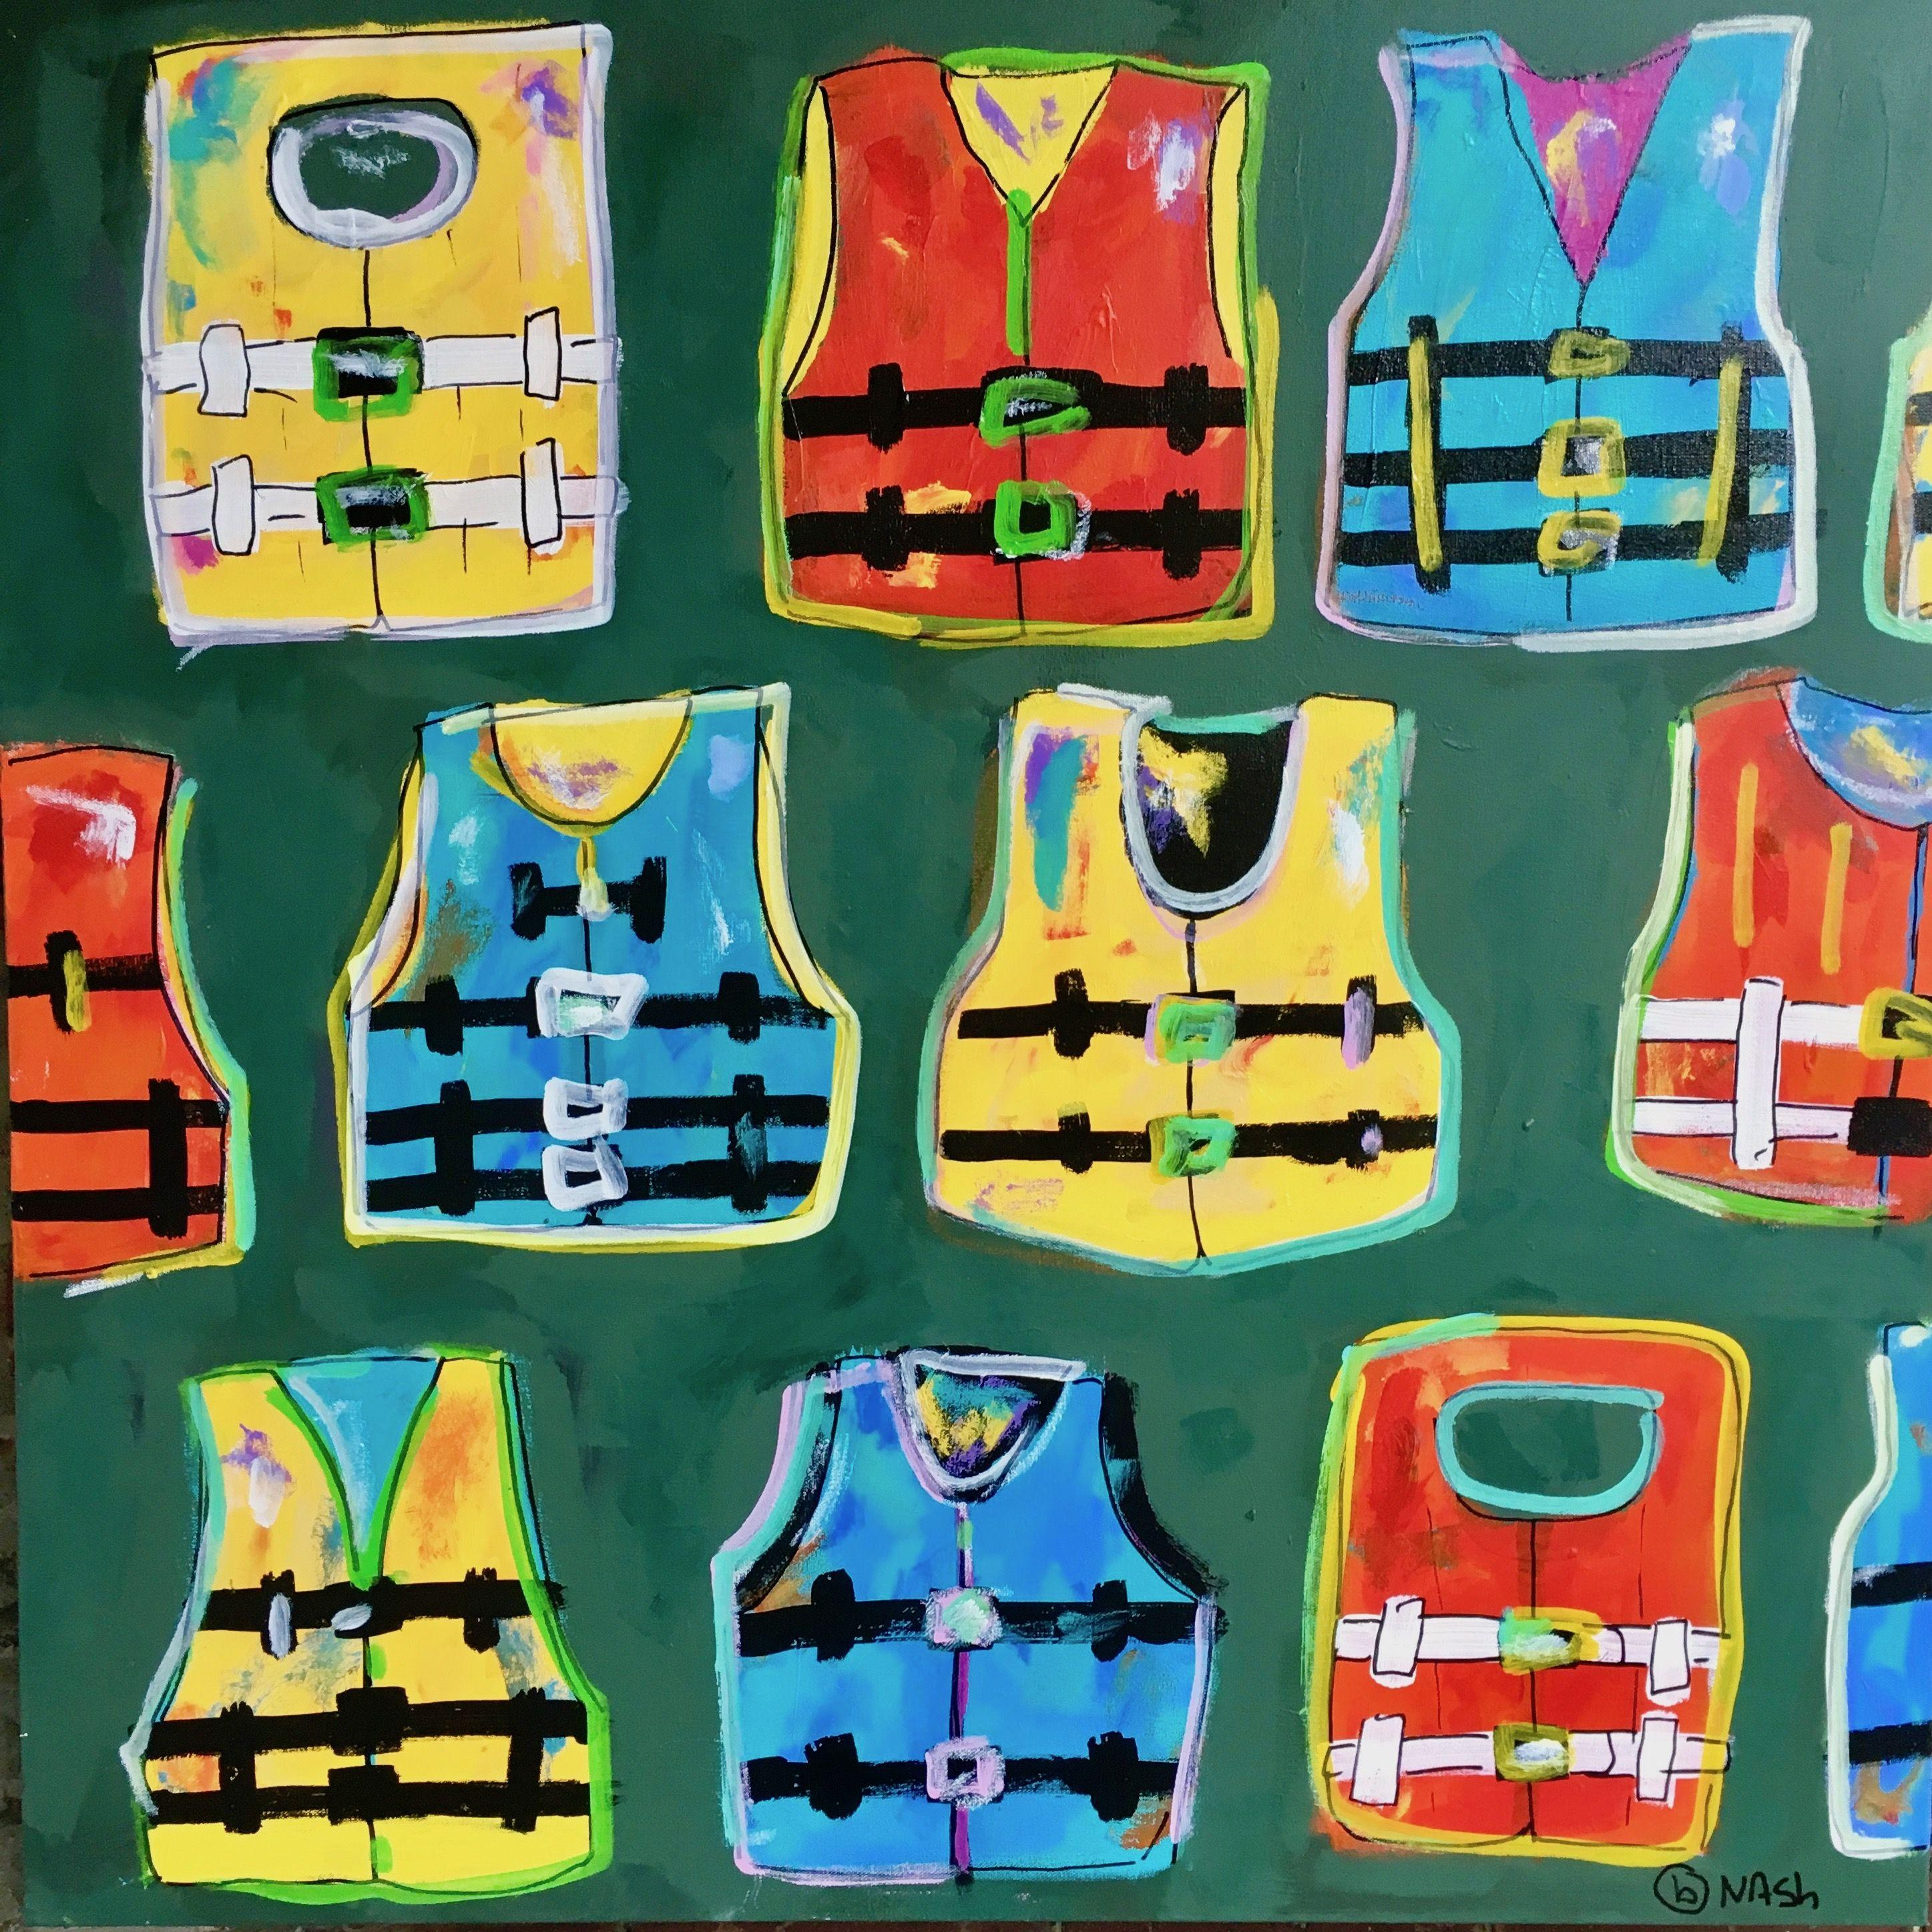 Life Jackets, Painting, Acrylic on Canvas